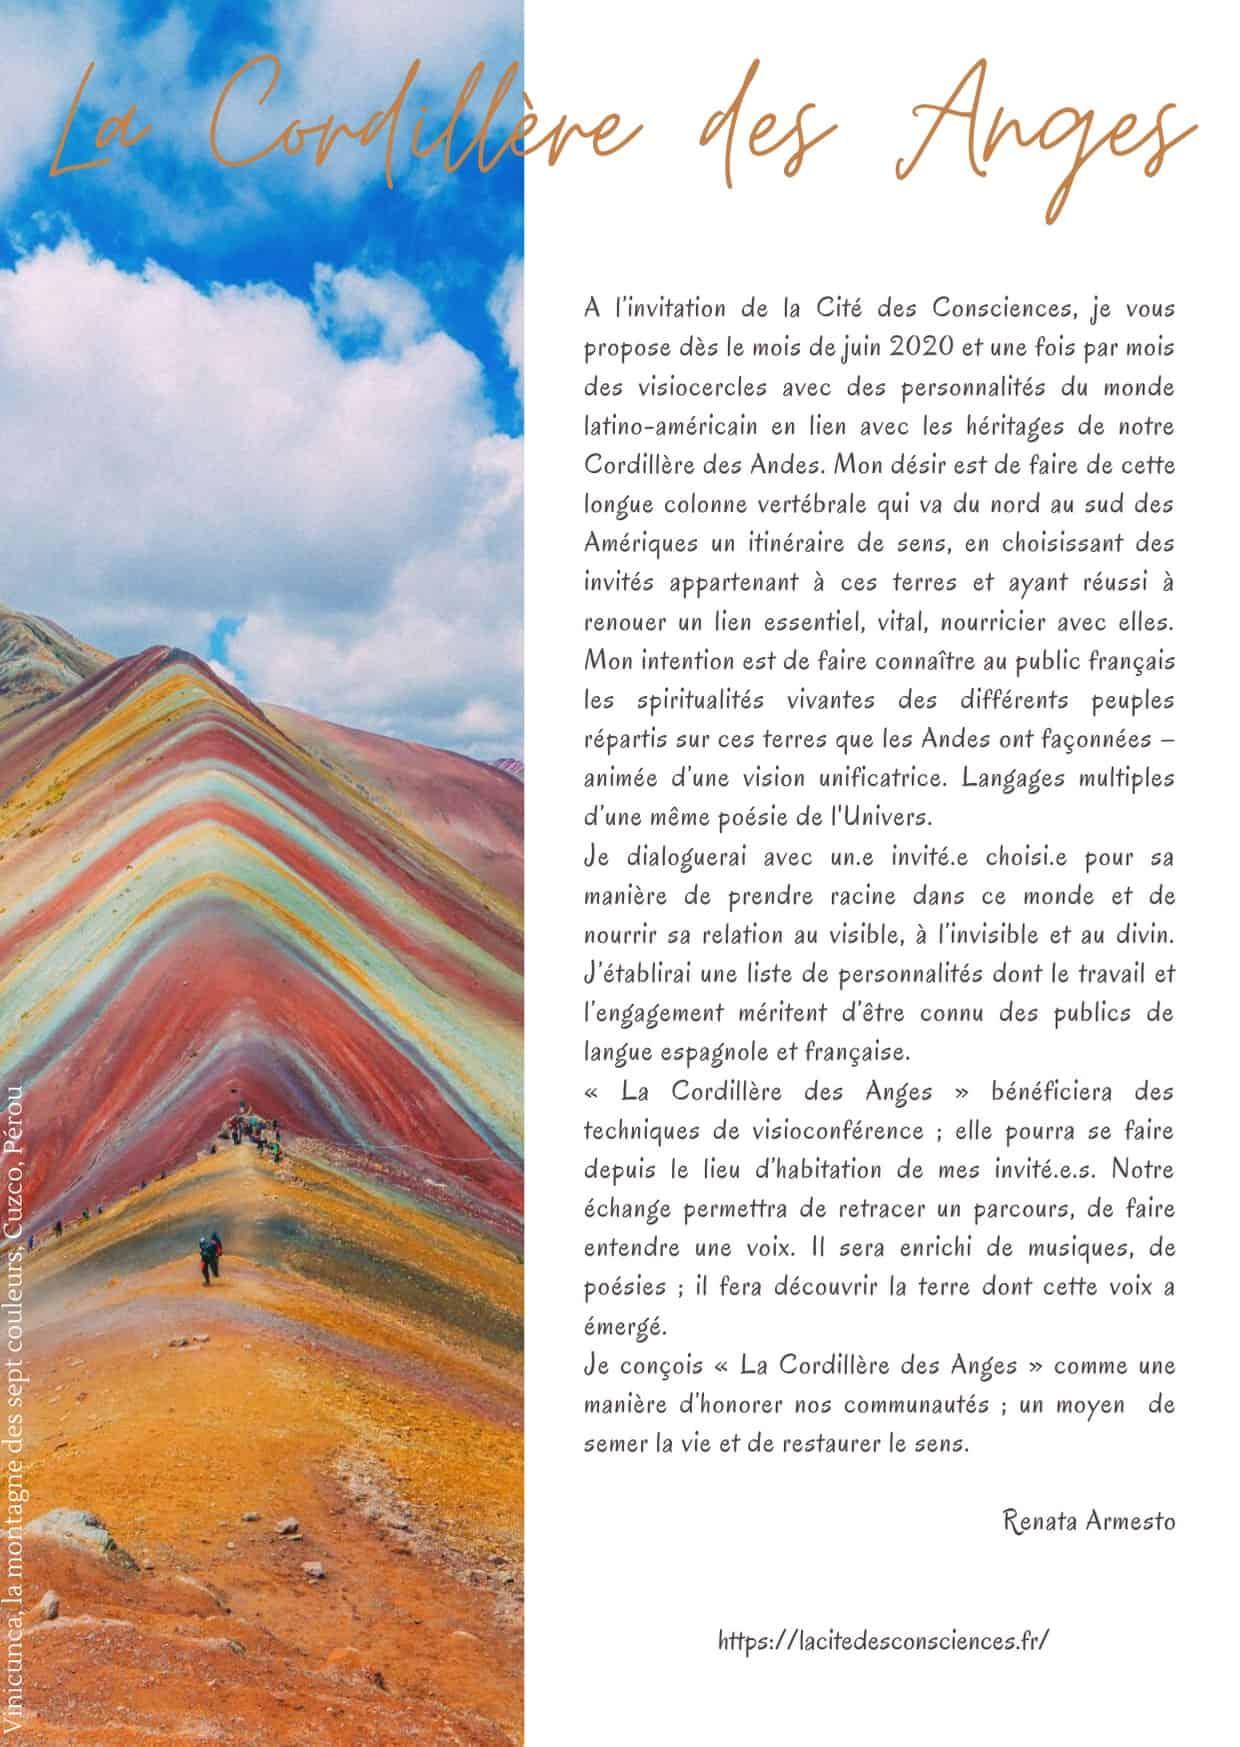 Renata Armesto - La Cordillere des Anges